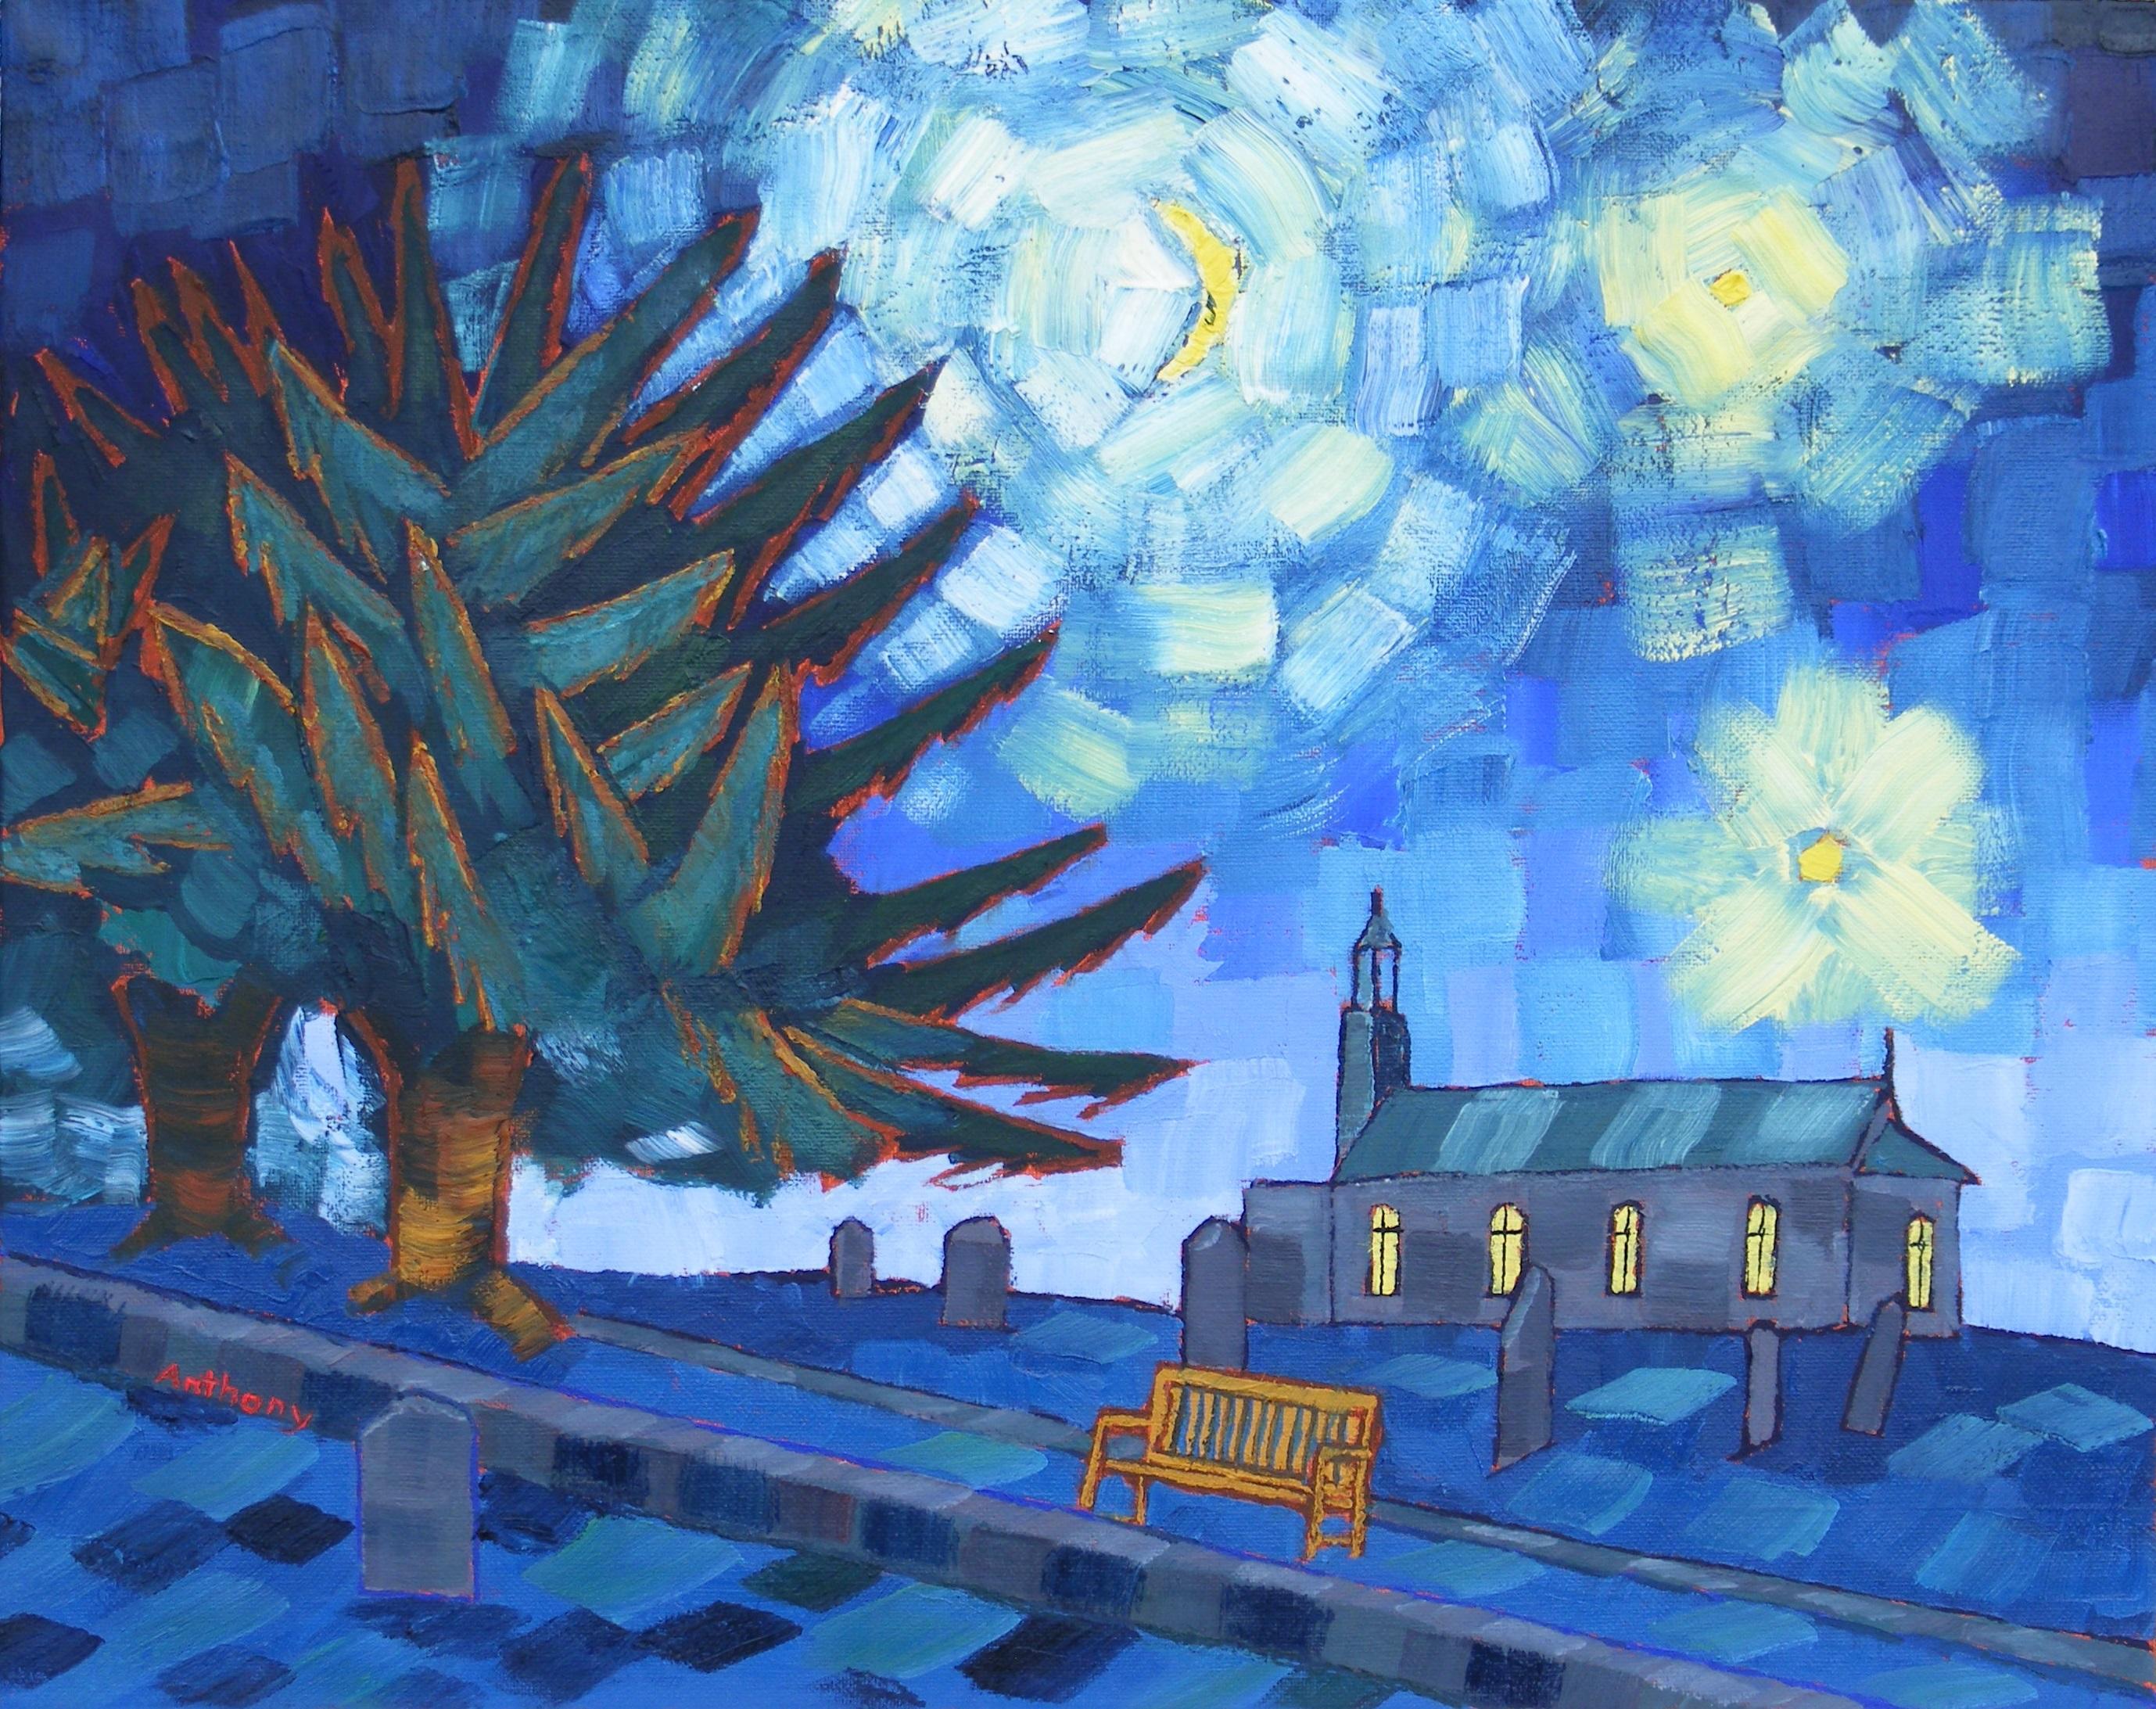 Starry Night after Vincent Van Gogh Saint Remy 1889 by Emerging British Artist